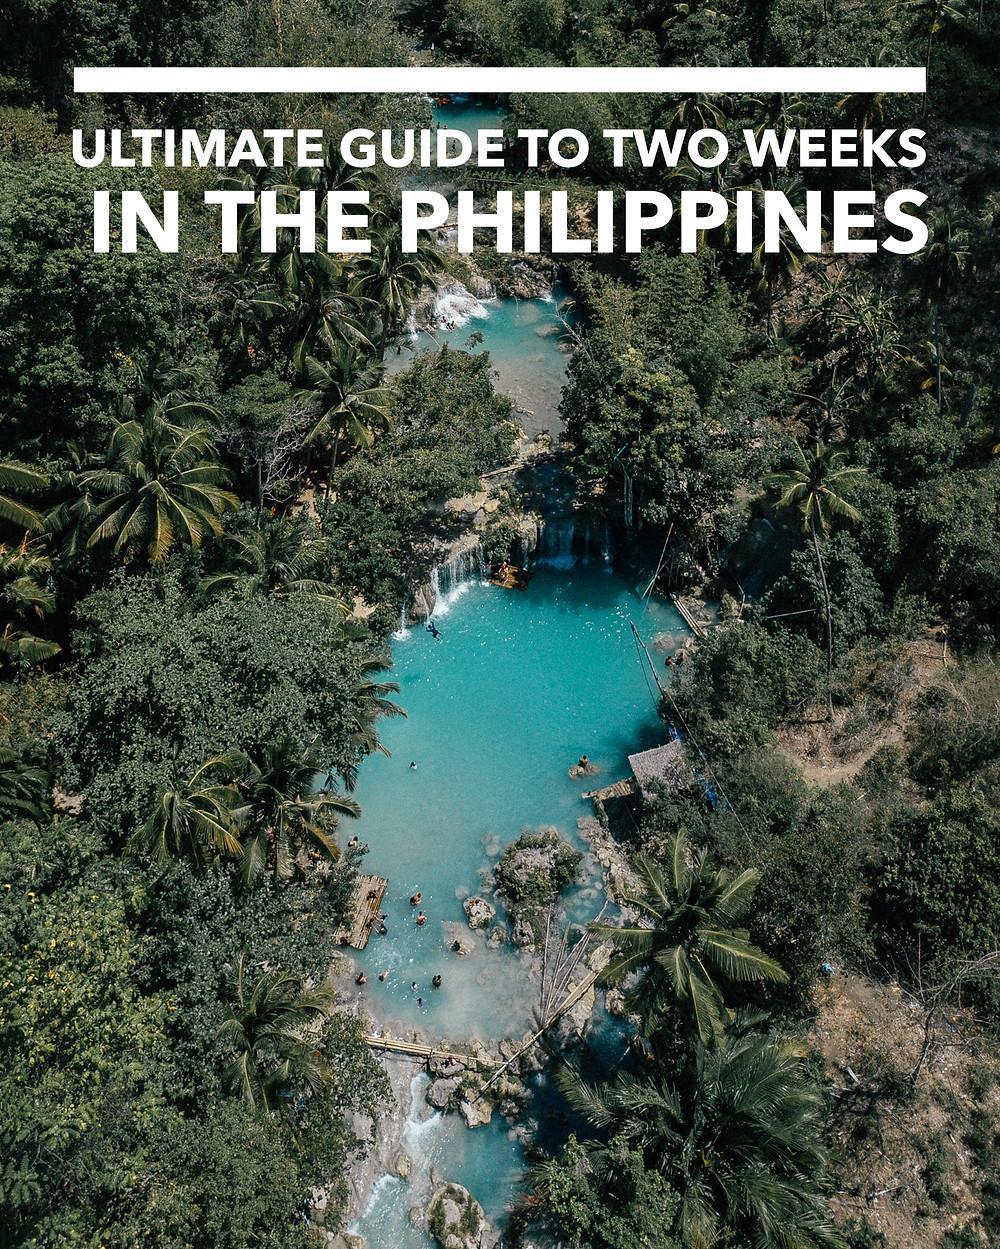 Palawan Bohol Philippines Travel Guide